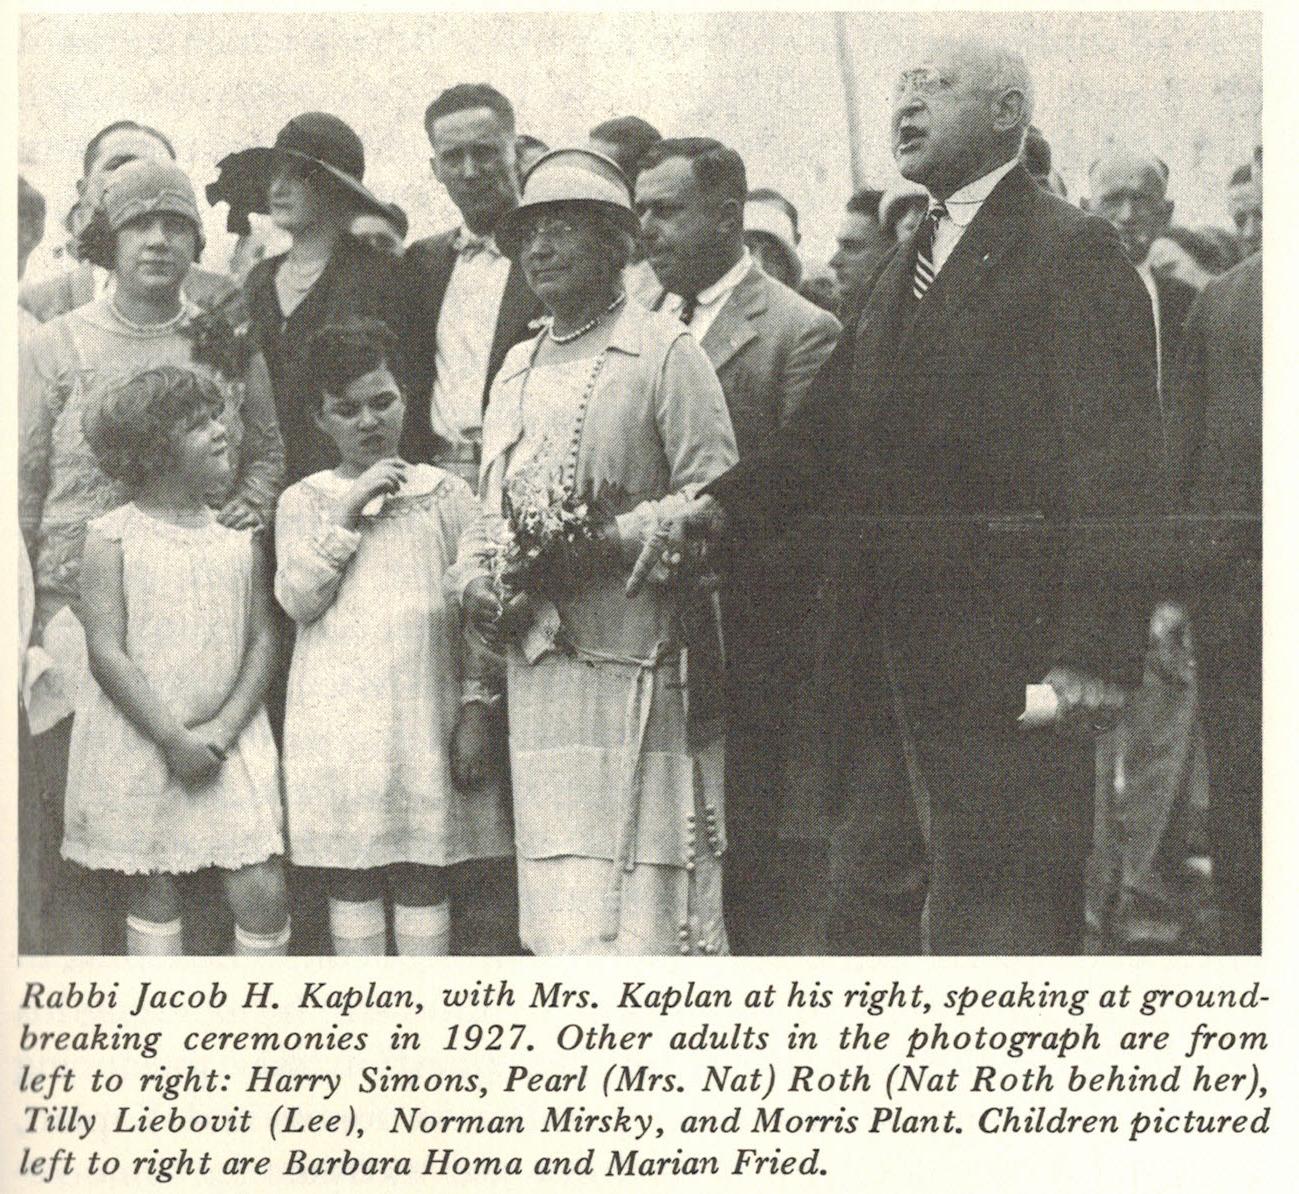 images/history/rabbikaplan.jpg